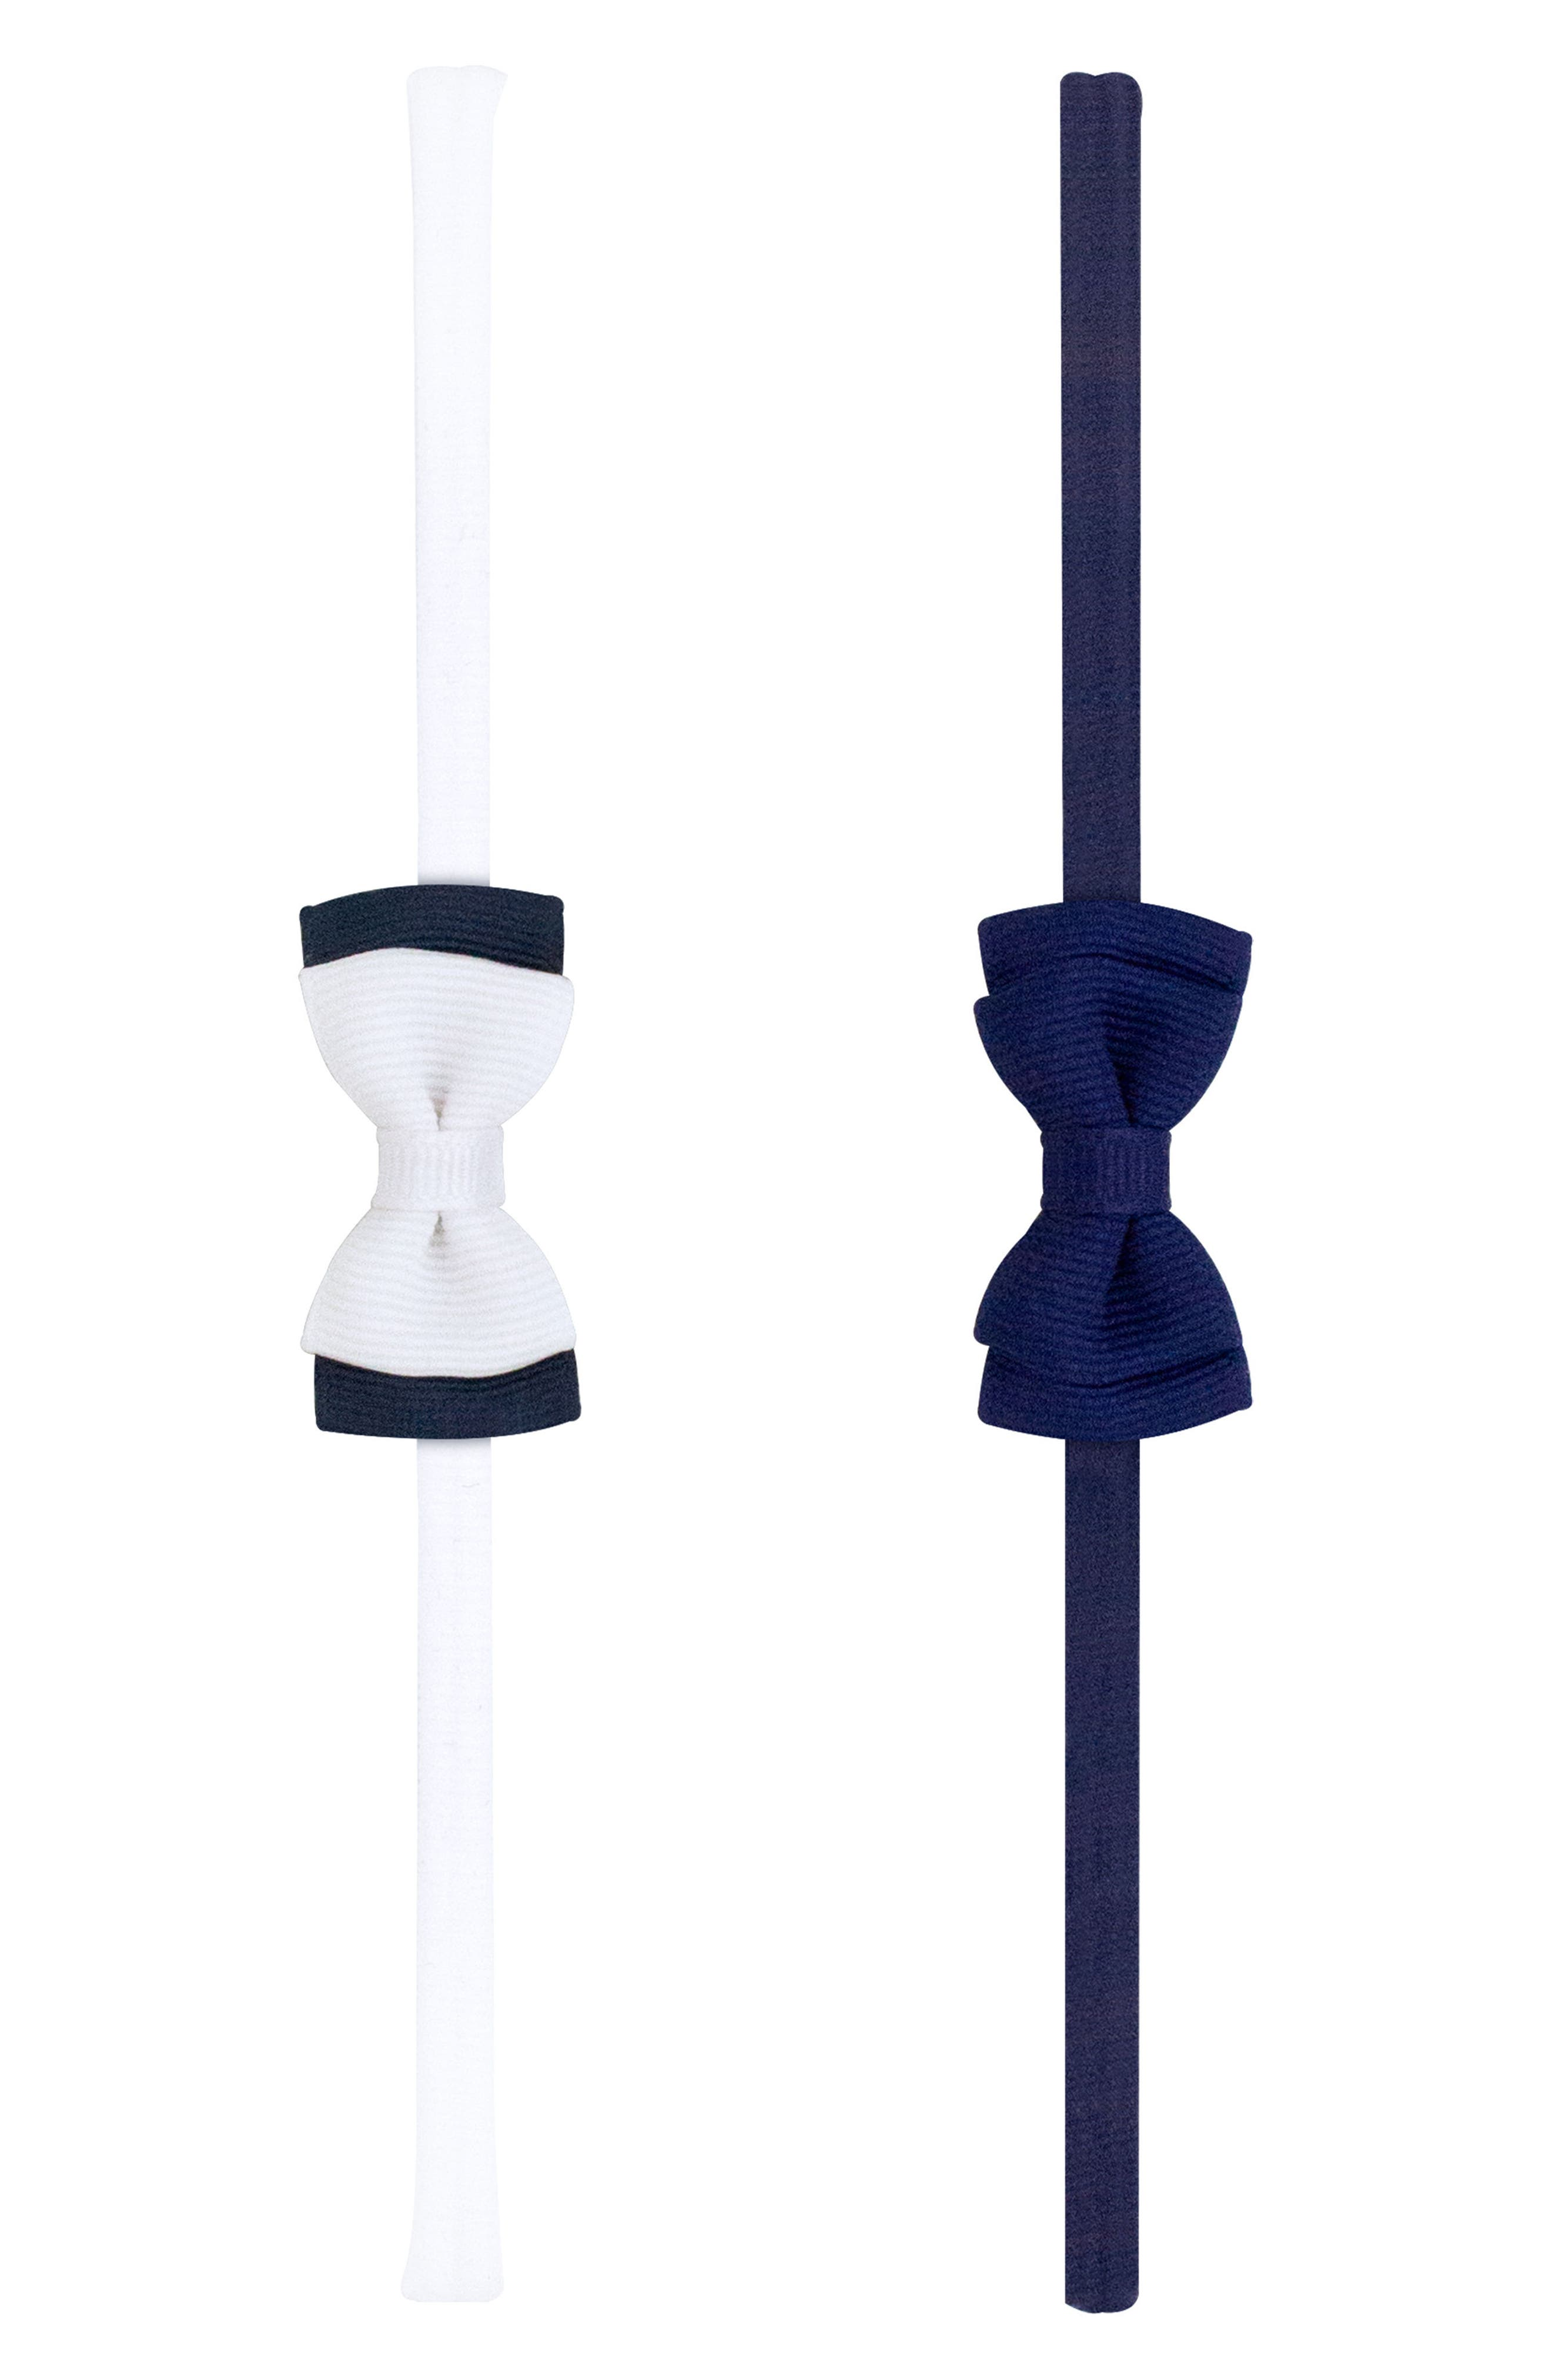 2-Pack Bow Headbands,                             Alternate thumbnail 2, color,                             Navy